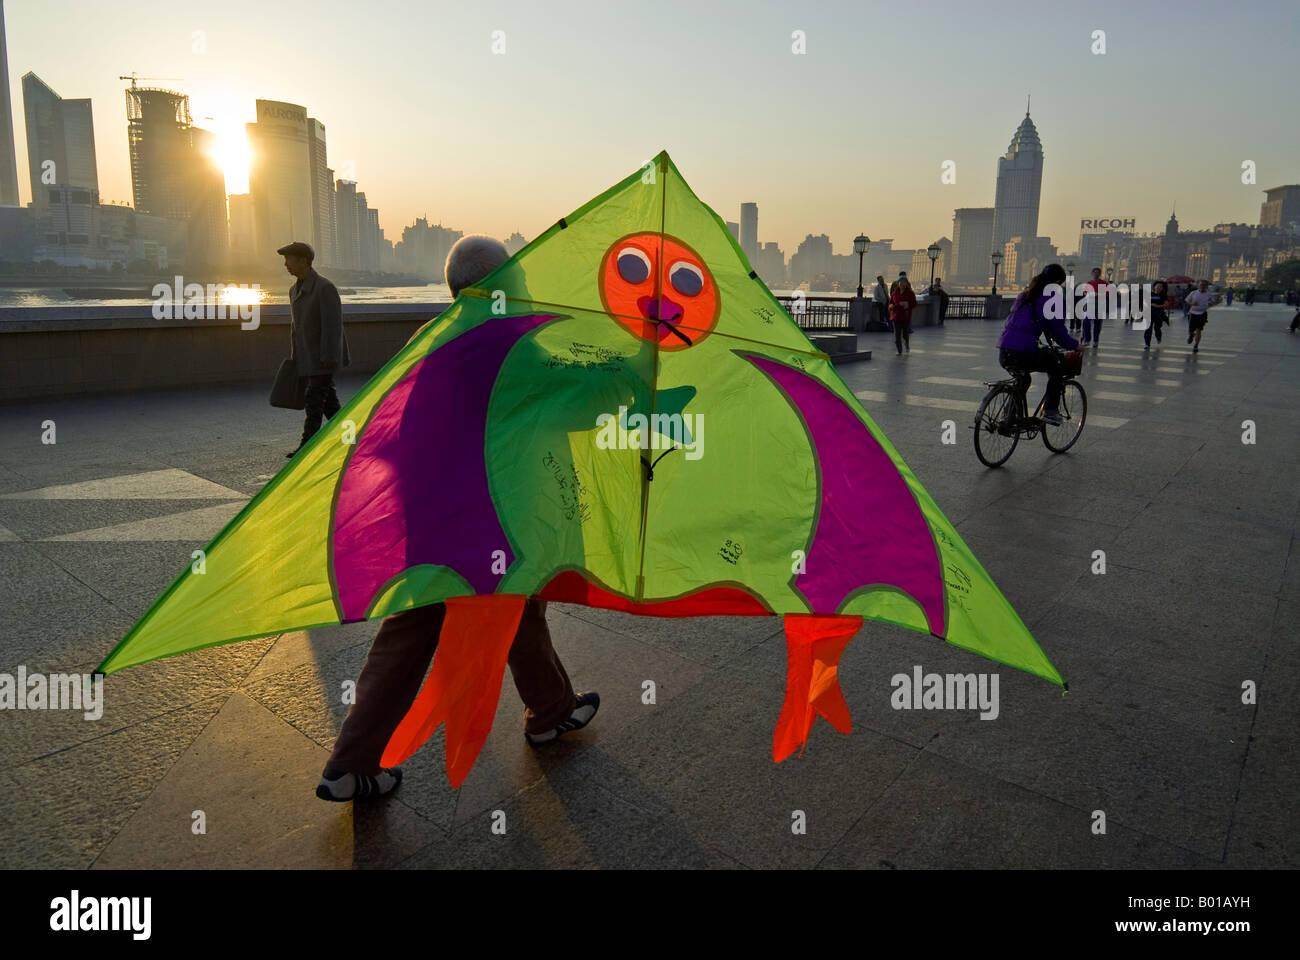 Sunrises over skyline as man prepares to fly kite, The Bund, Shanghai, China - Stock Image